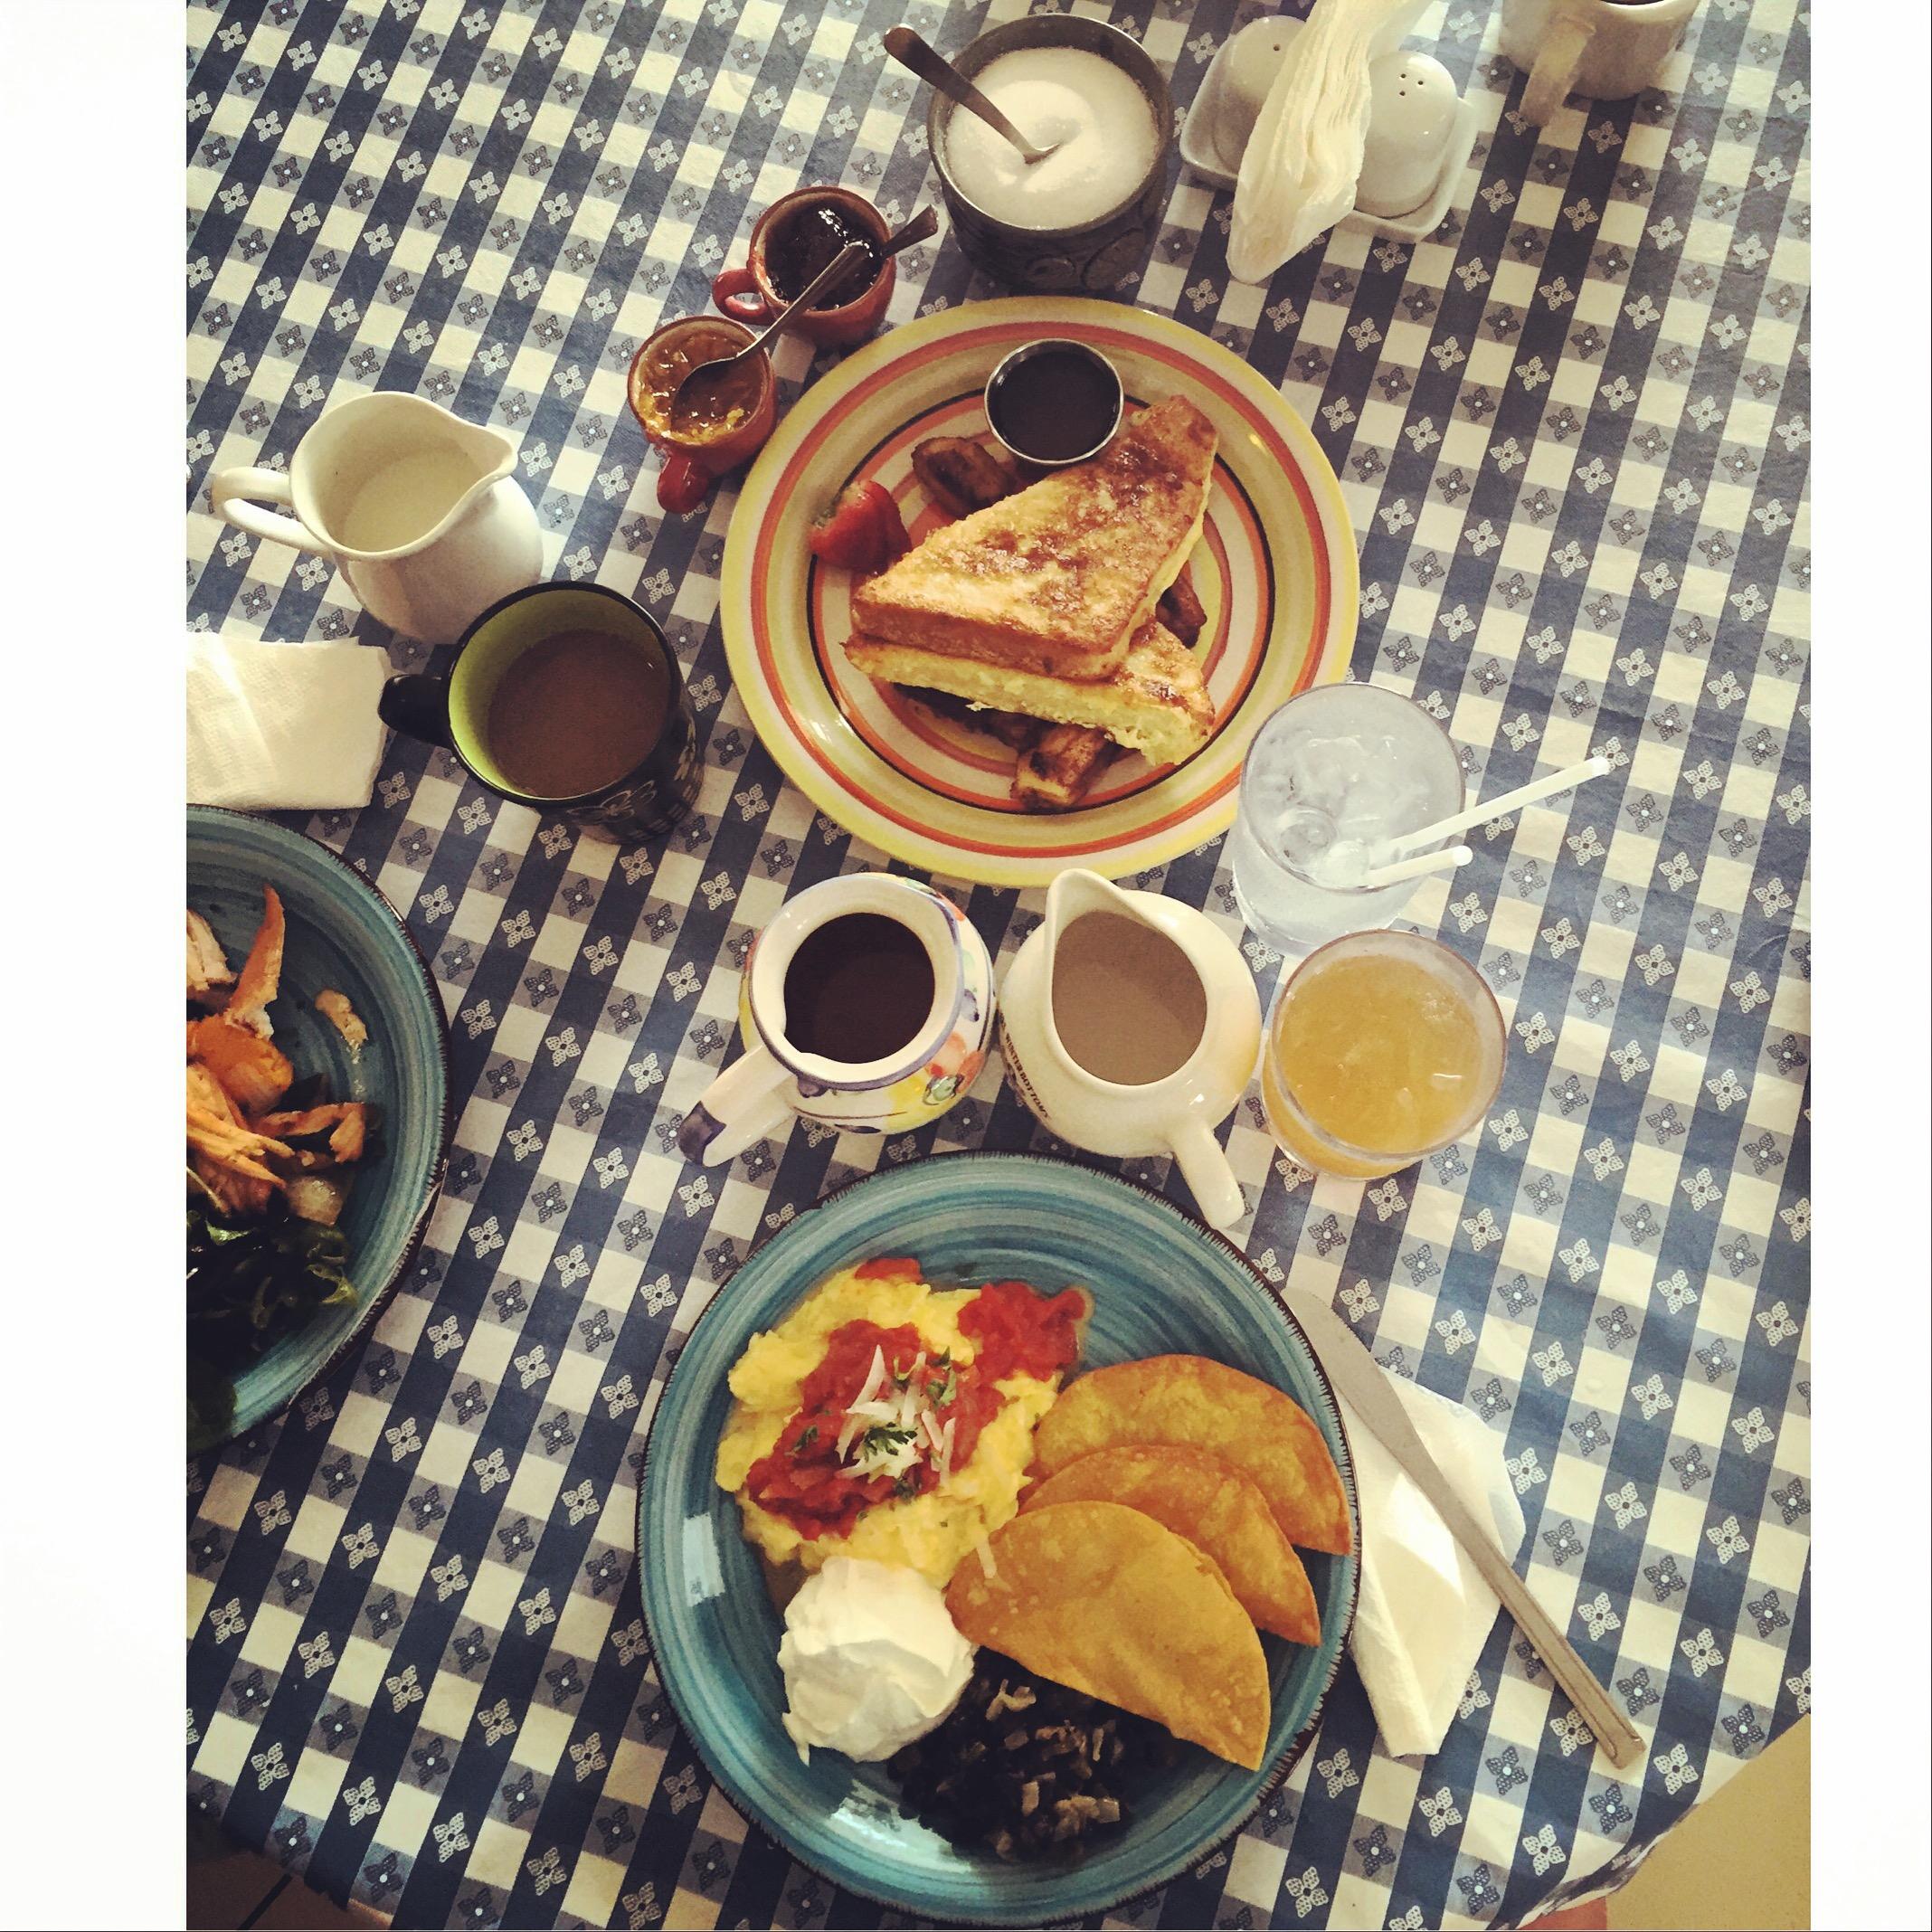 English Breakfast at RIncon